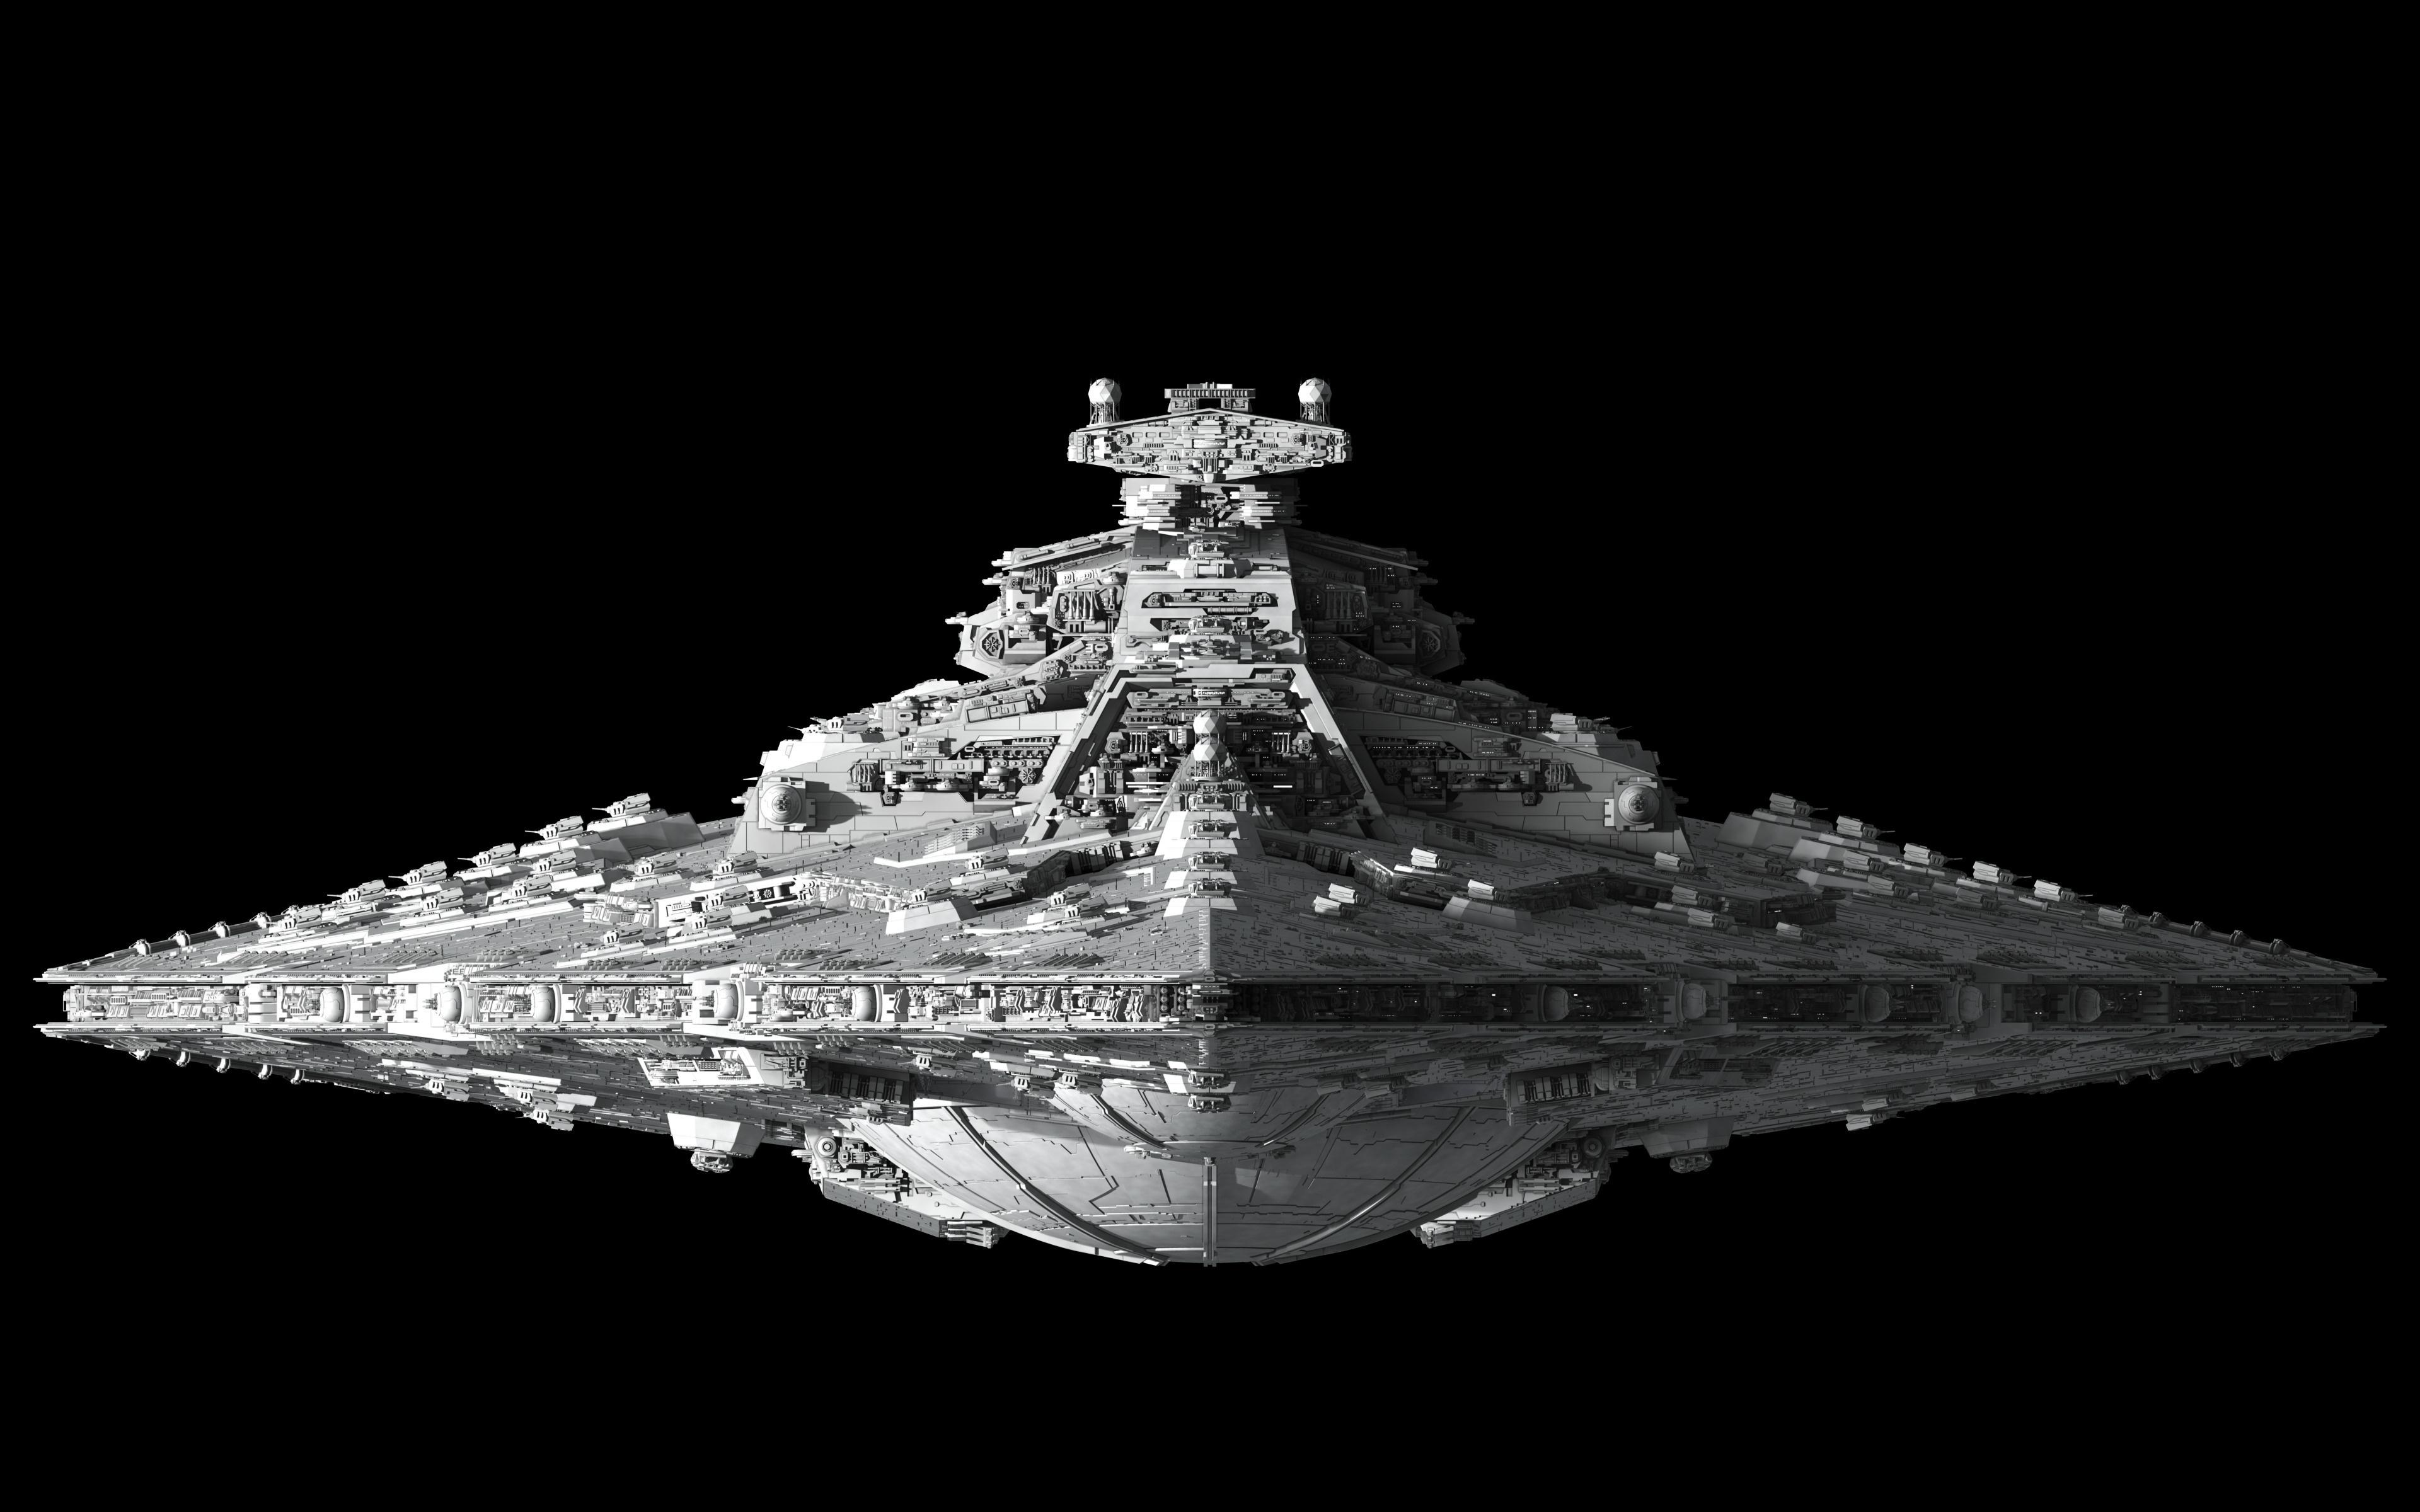 Imperial Star Destroyer.jpg